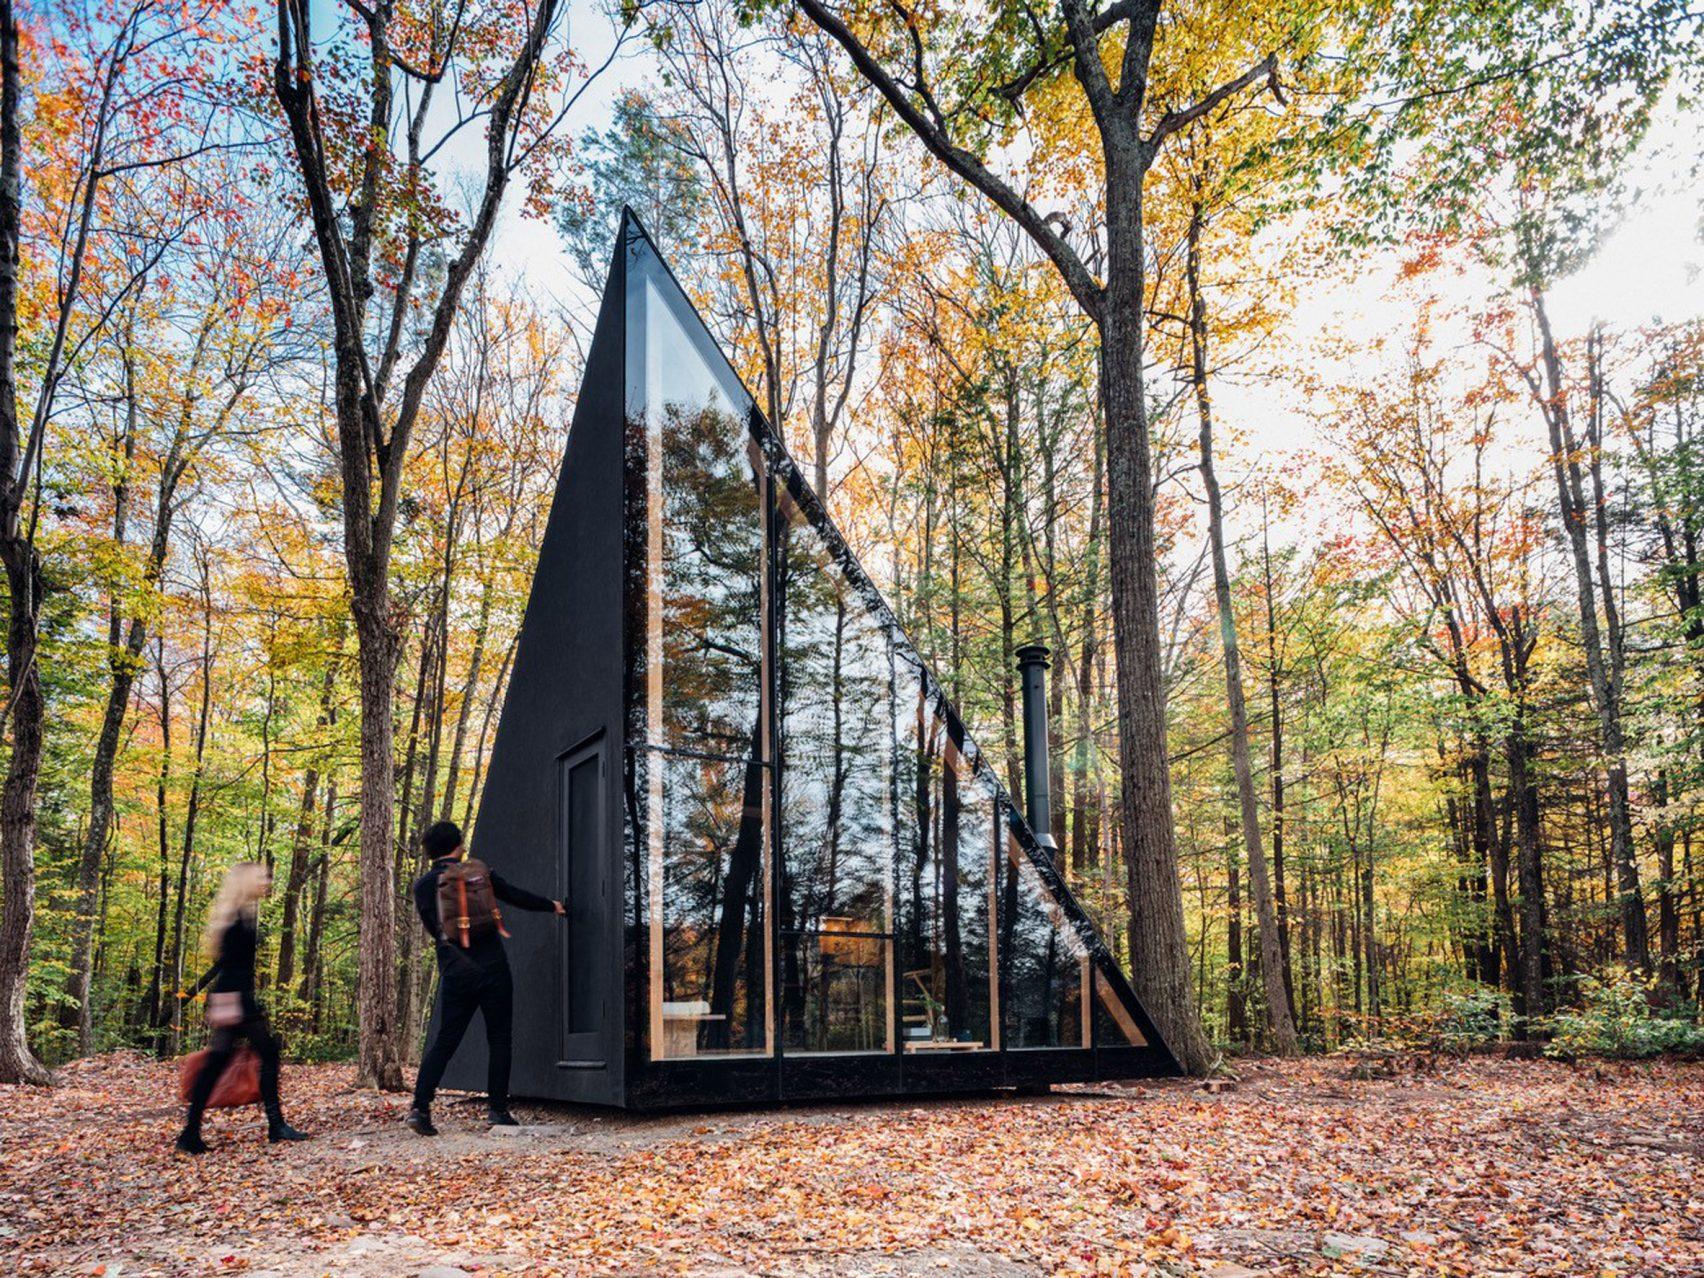 Vreemd: dit huisje kan je bijna overal kwijt